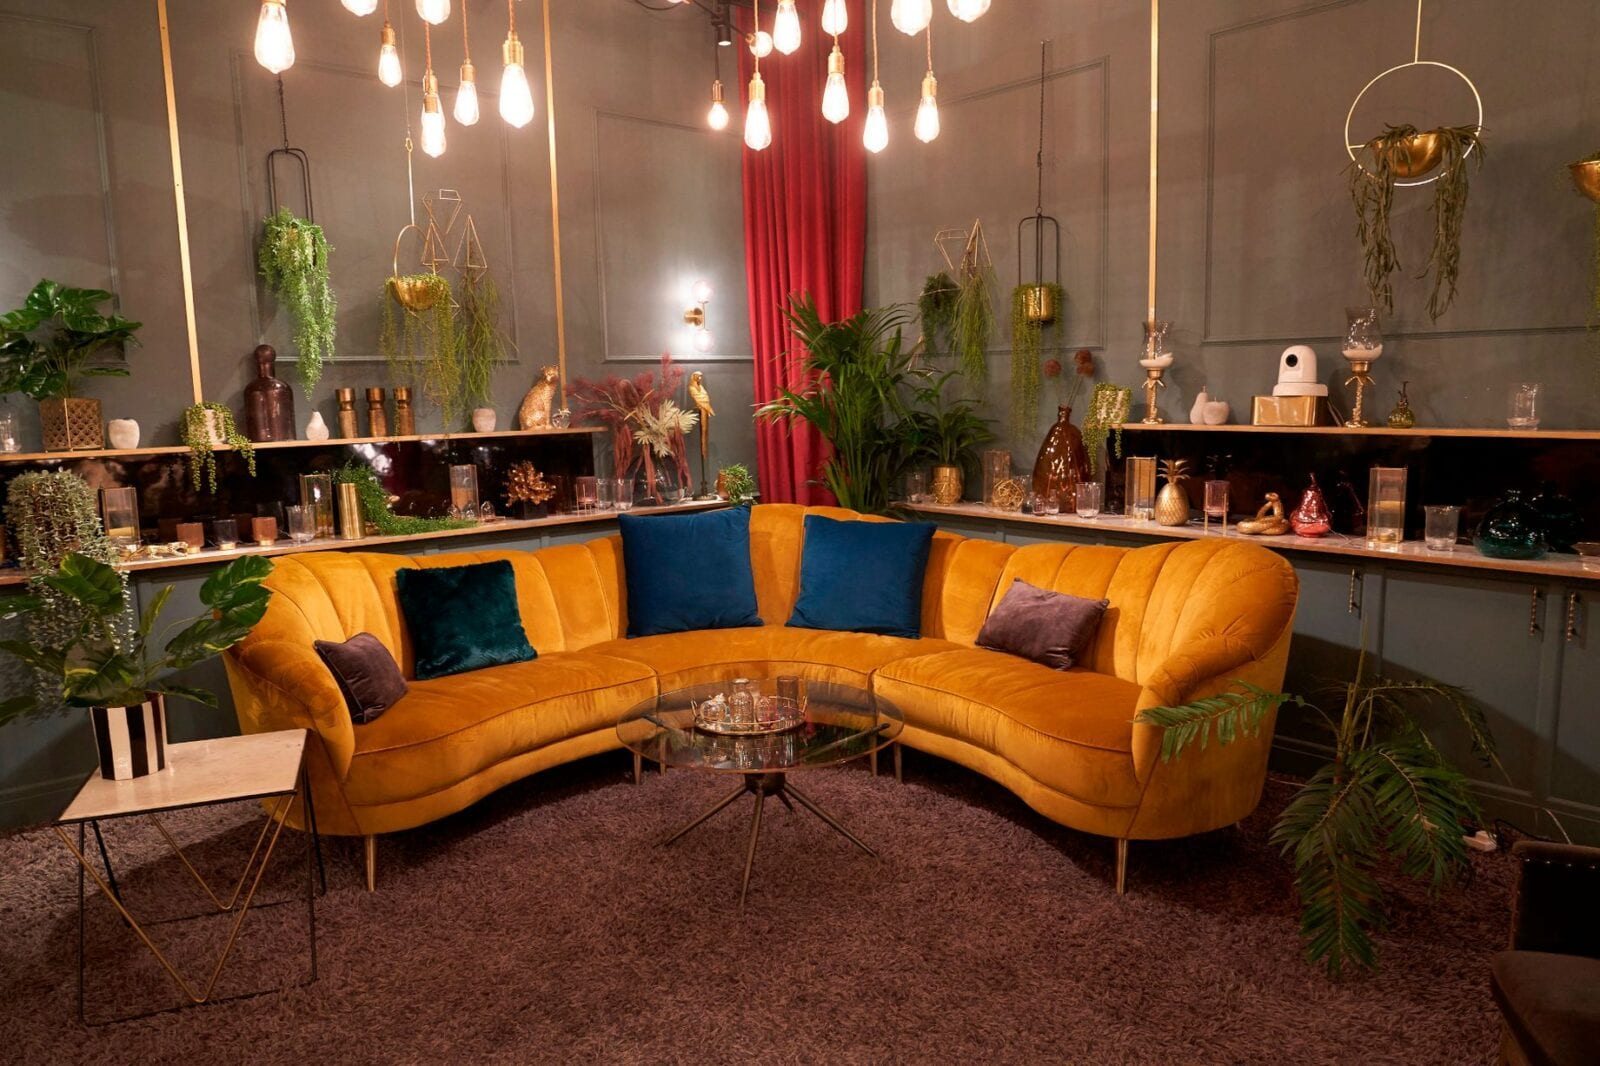 Inside look at new First Dates Spinngfields restaurant as the show returns next week, The Manc